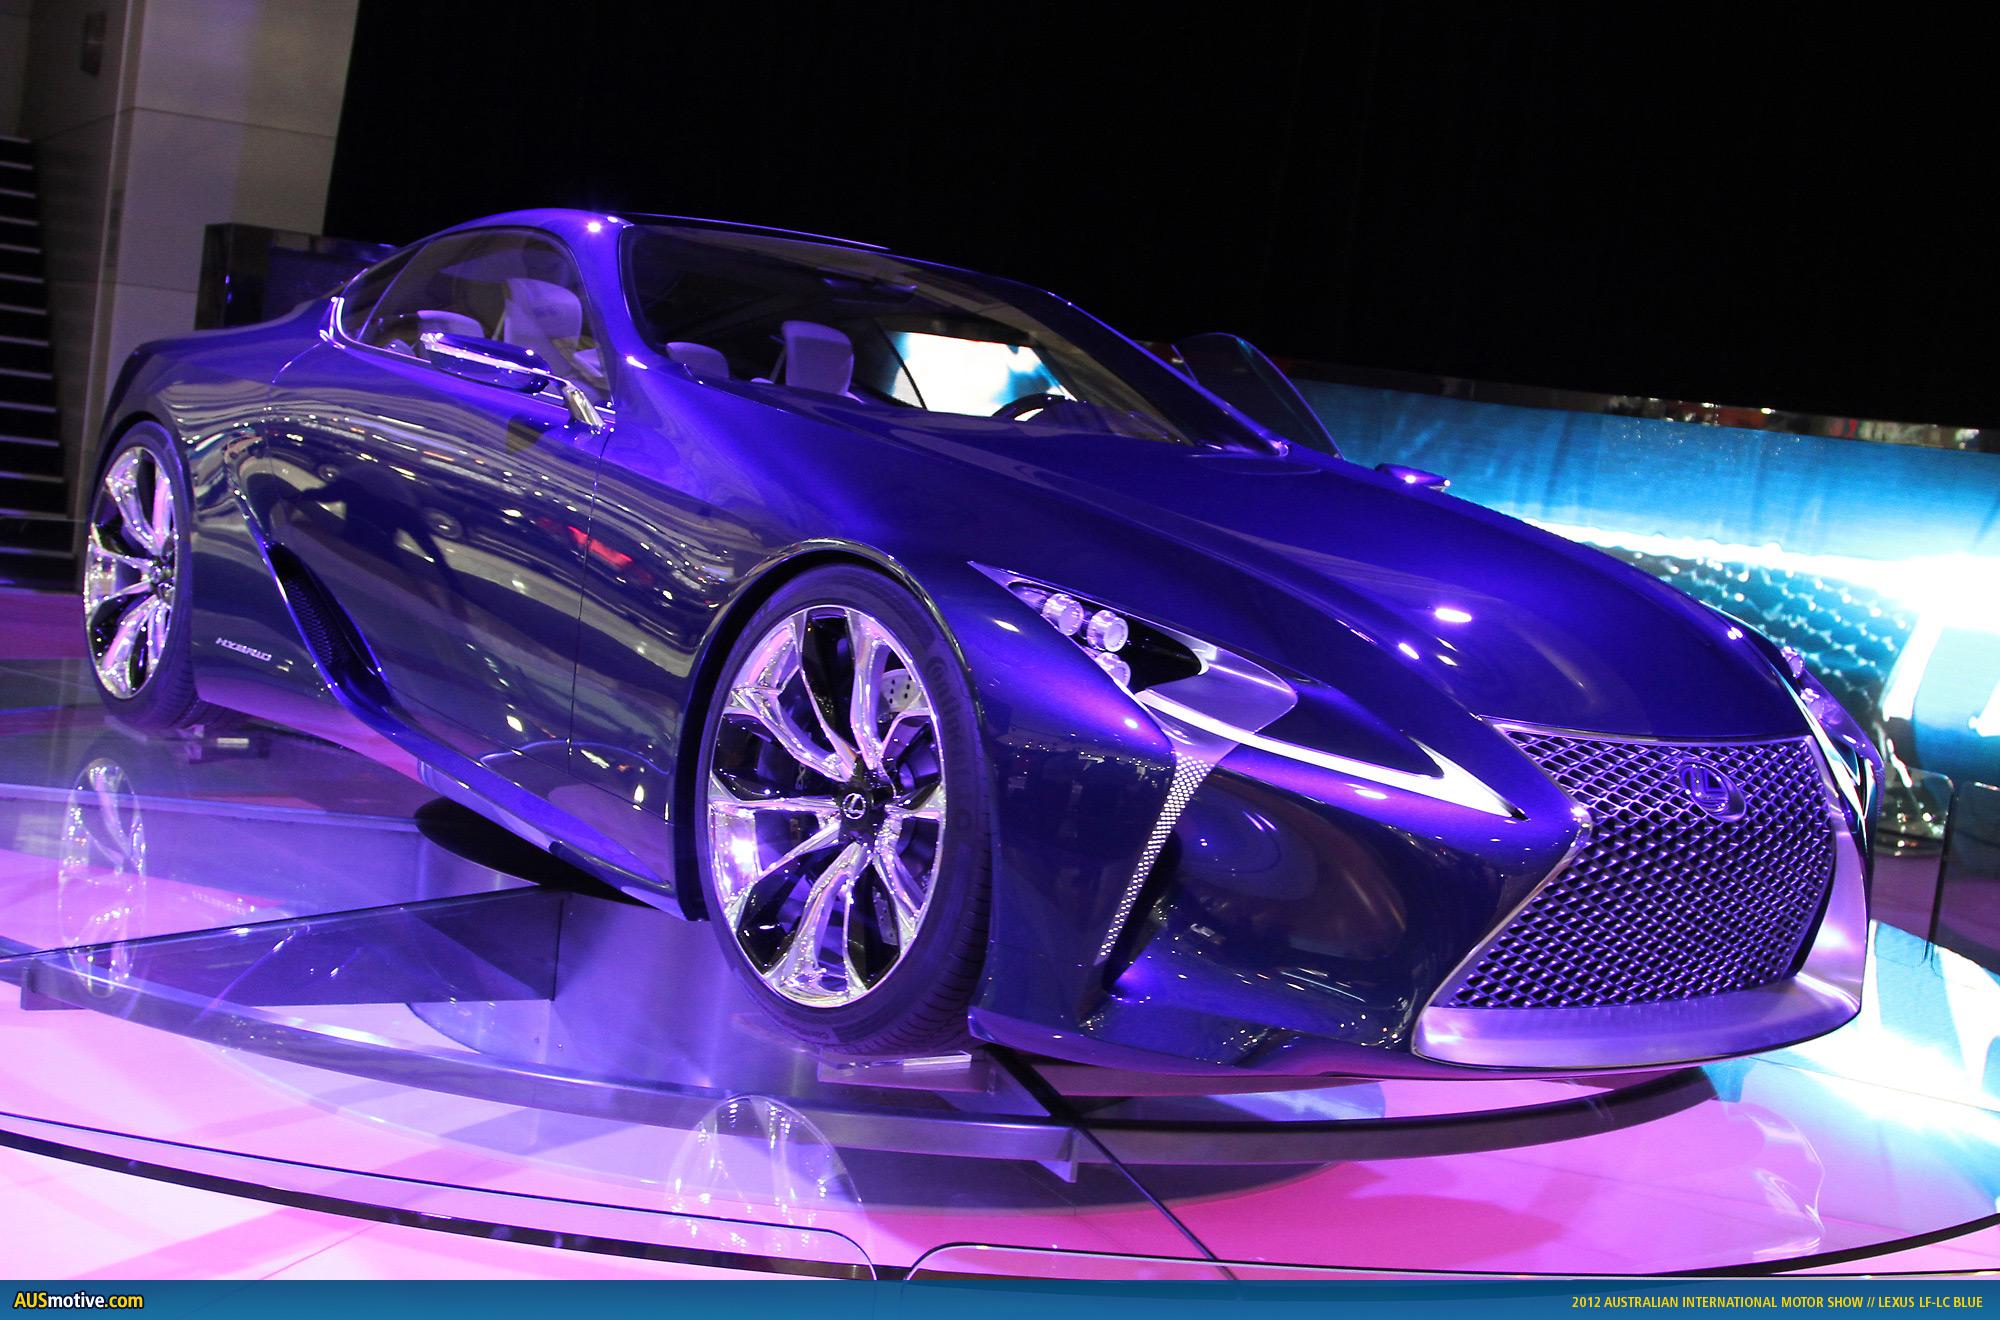 http://www.ausmotive.com/pics/2012/AIMS/Lexus-LF-LC-02.jpg